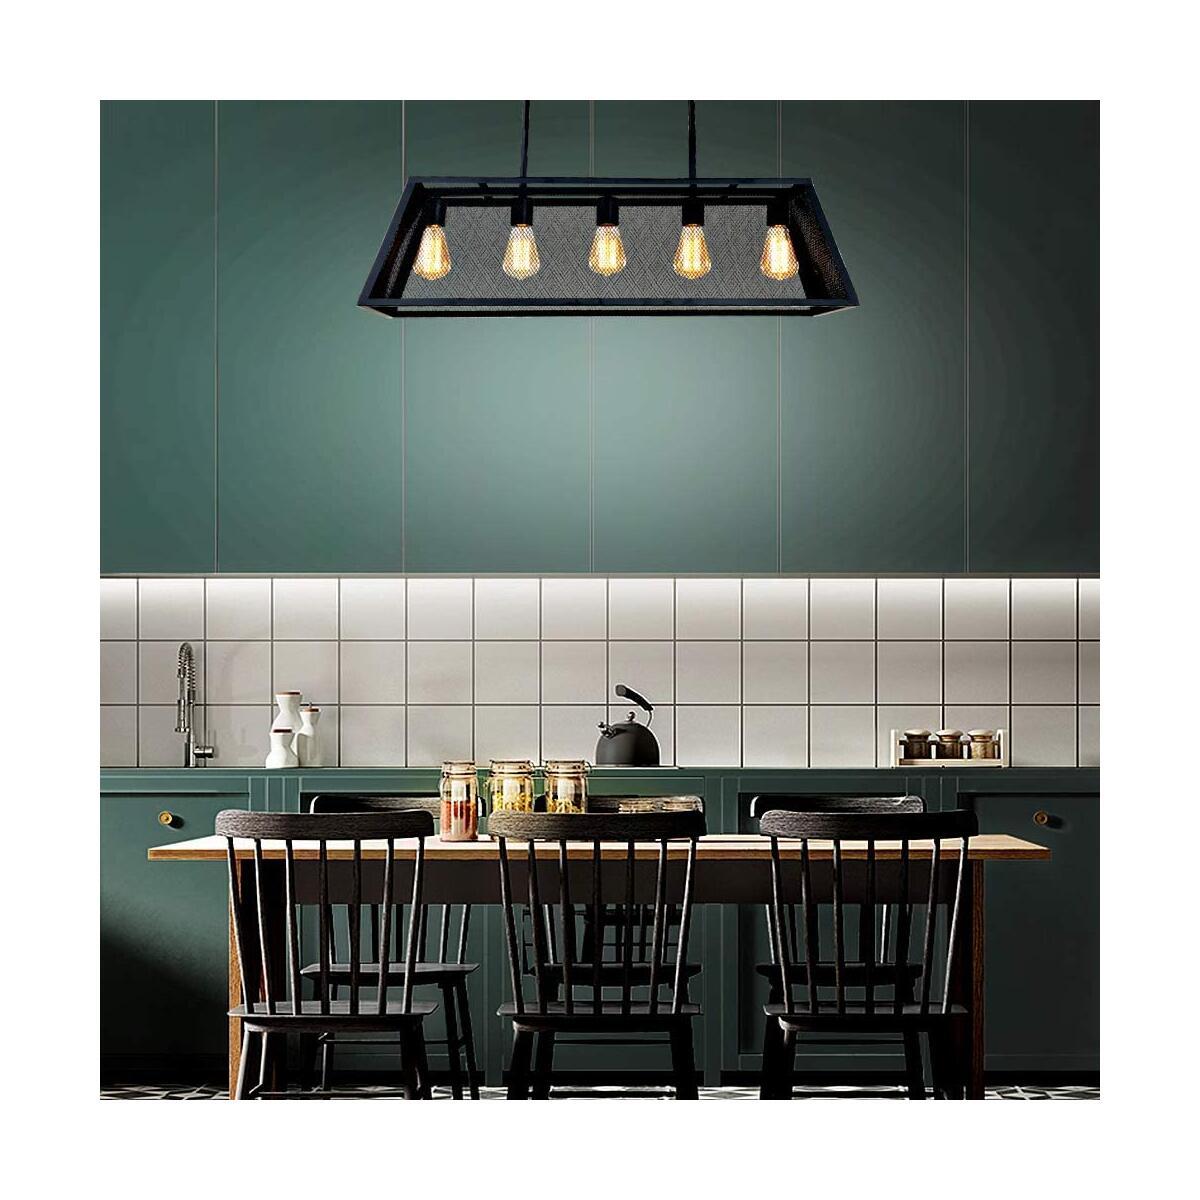 5-Light Industrial Kitchen Island Lighting, 26